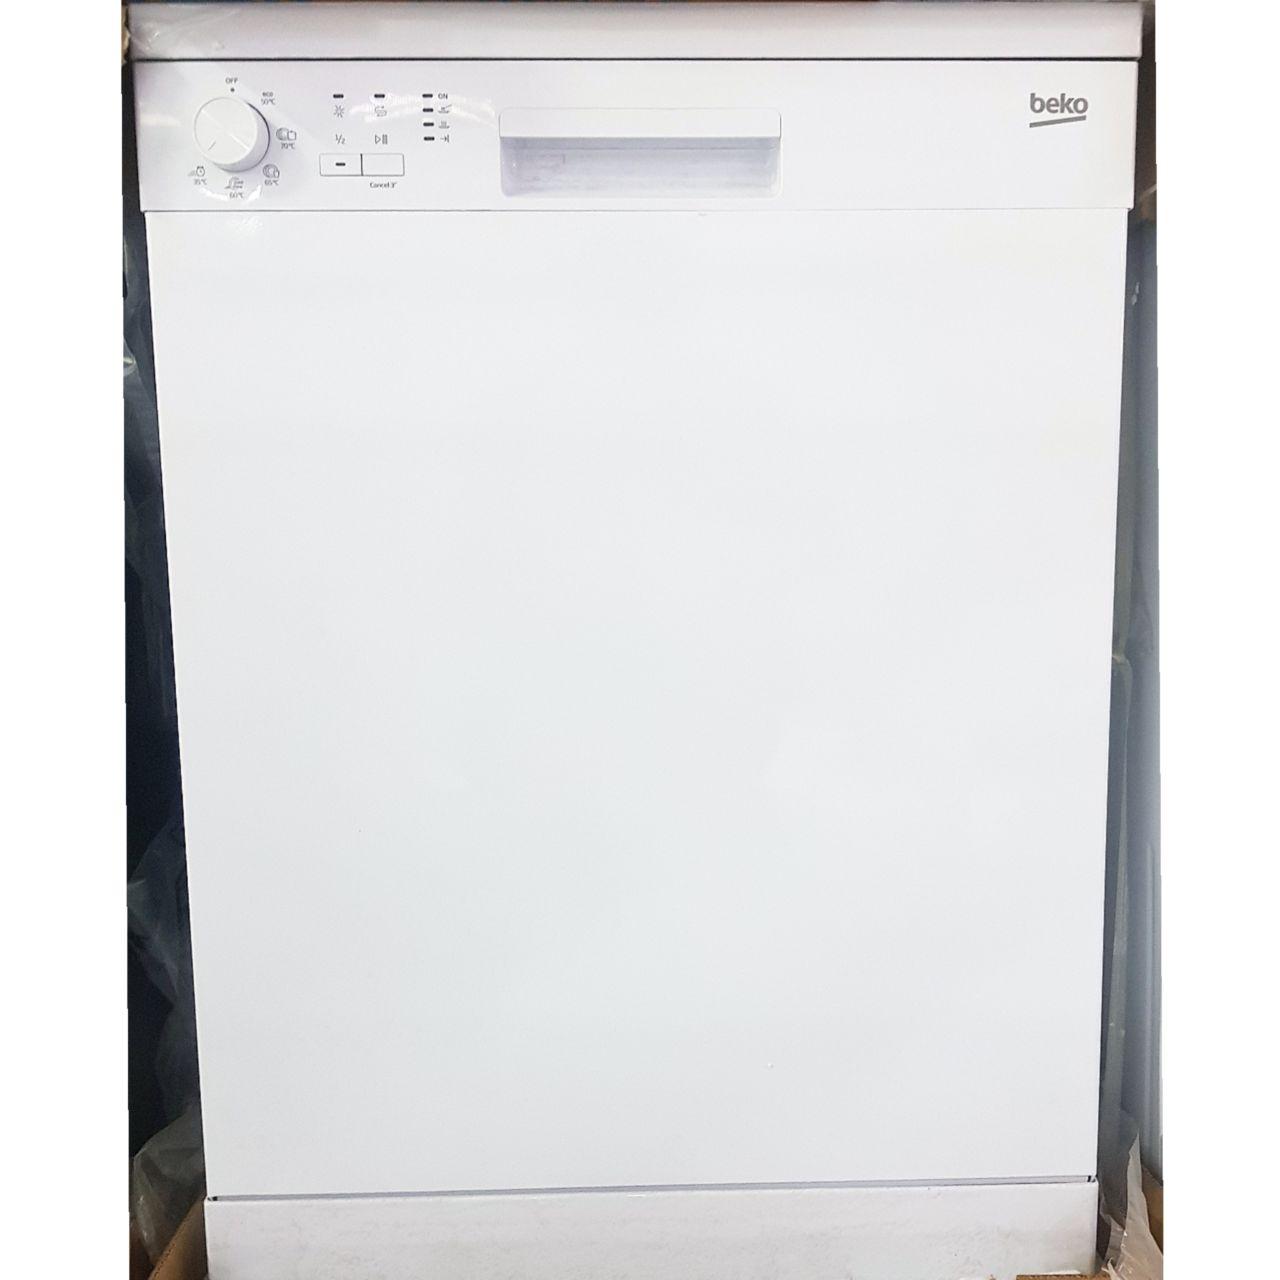 Посудомоечная машина Beko на 13 персон белая